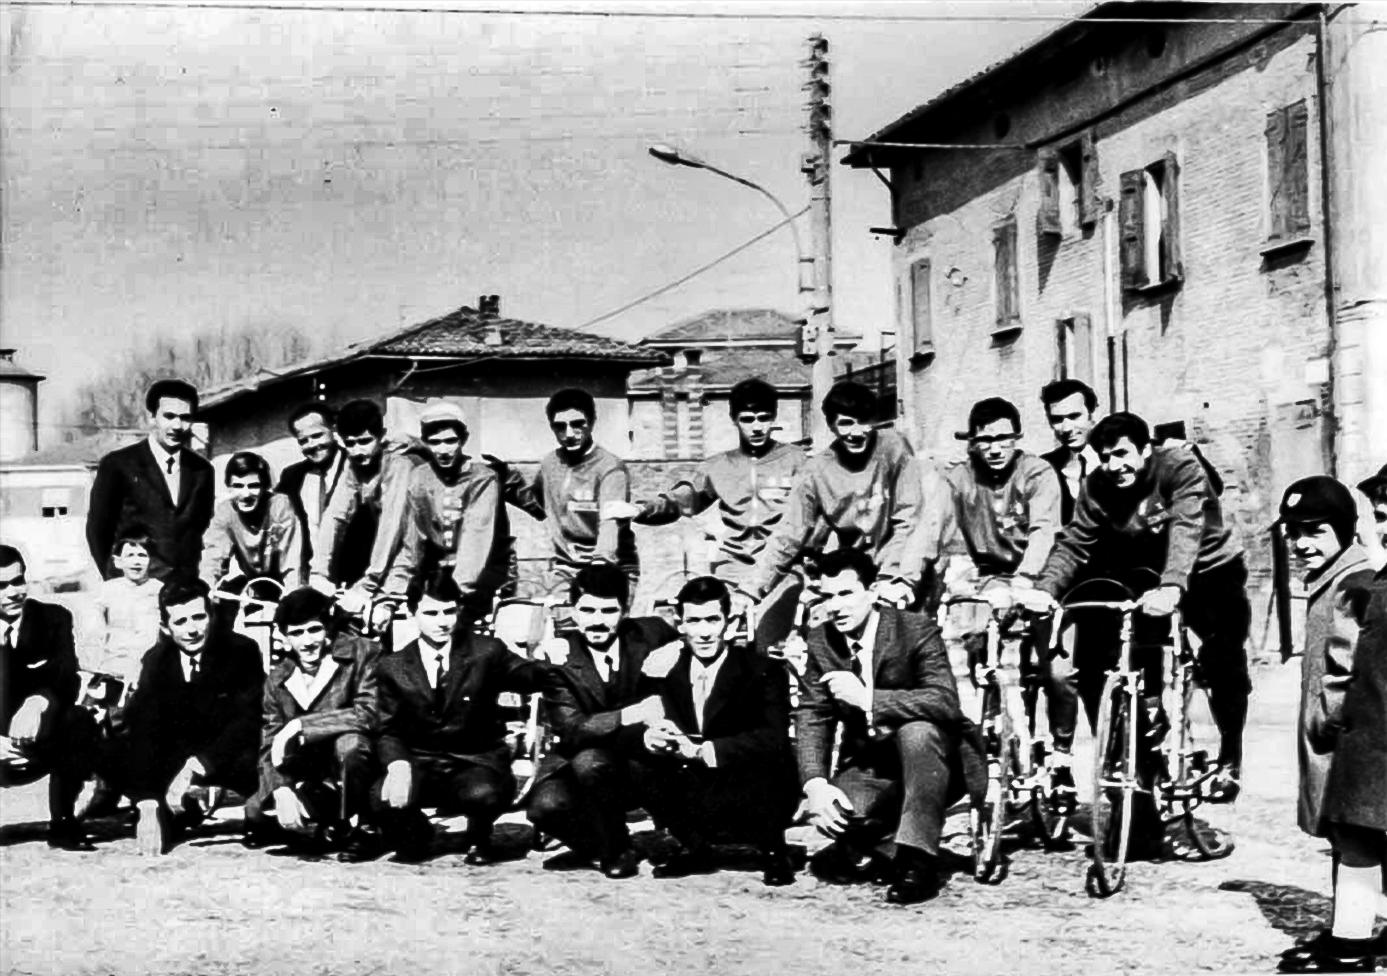 Squadra ciclistica U.S. Dossese